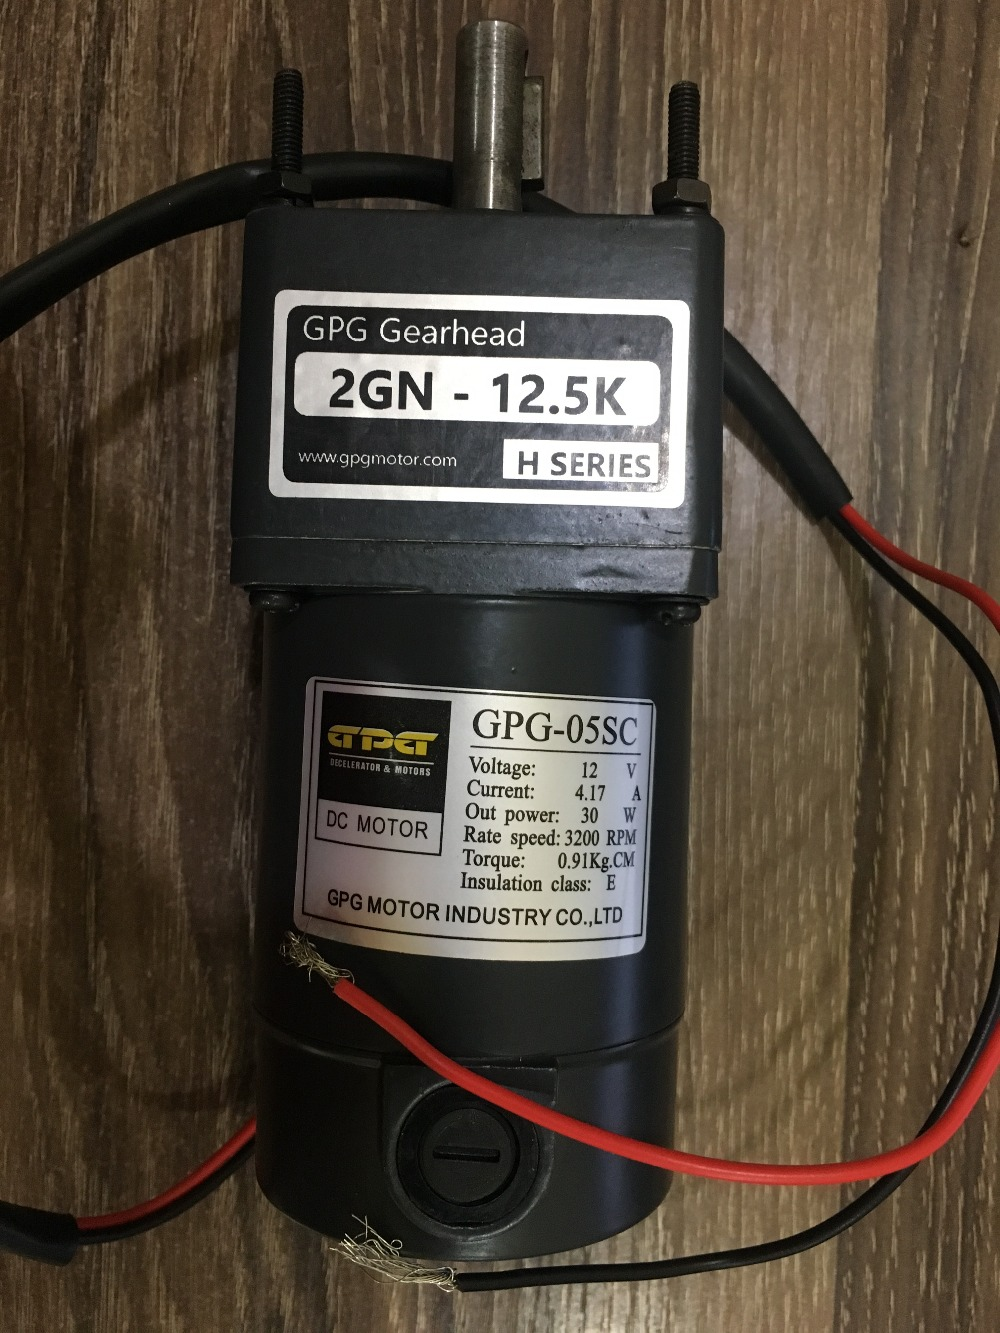 2GN 12 5k Taibang 12V 30W DC Motor Reducer Motor Brushed GPG 05SC replace GPG 06SC